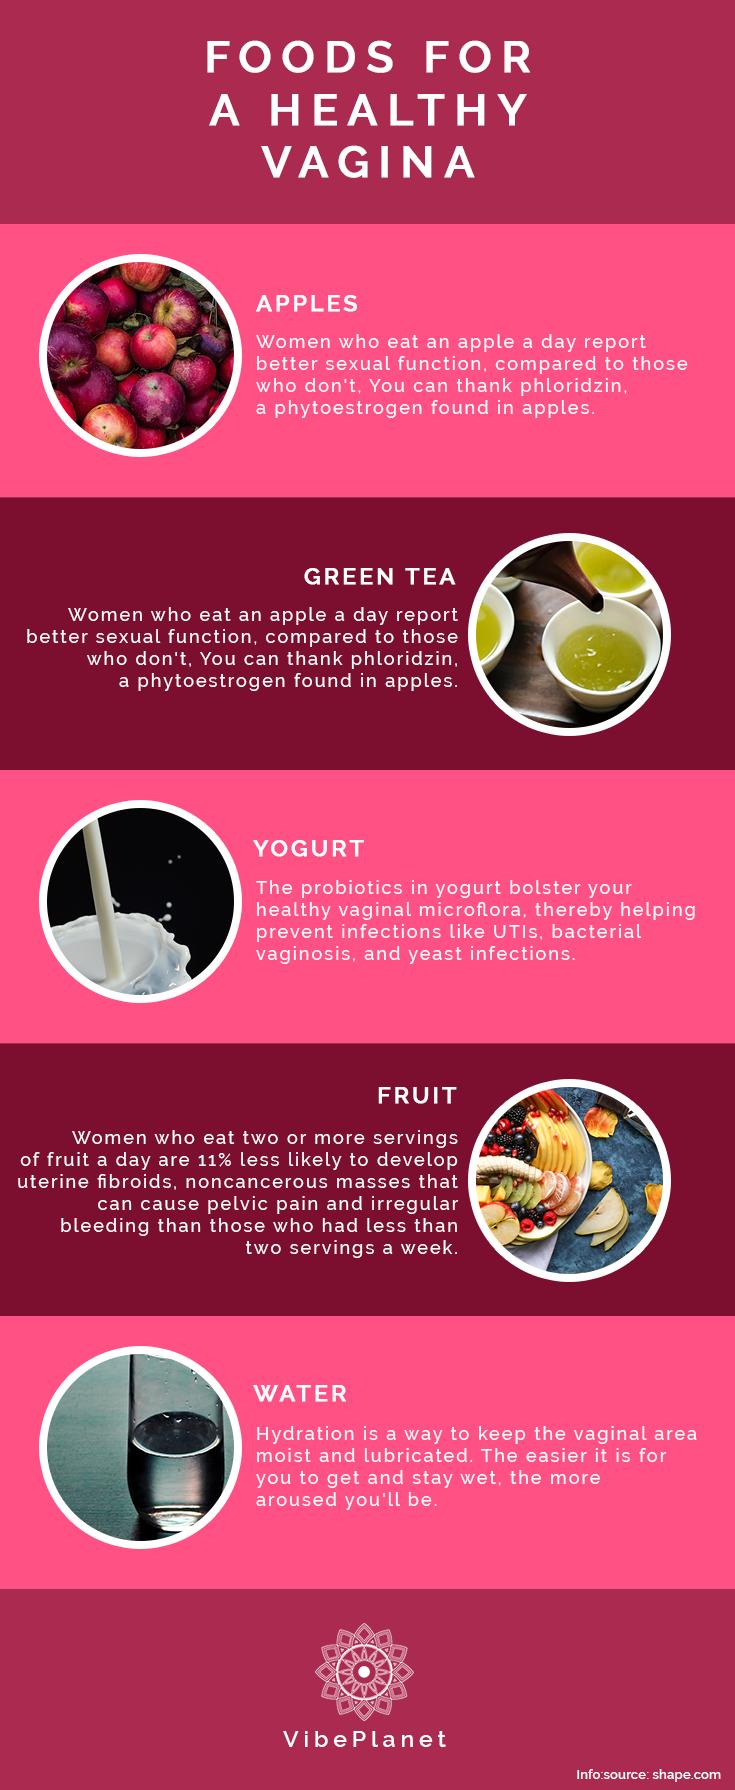 Tea for feminine health